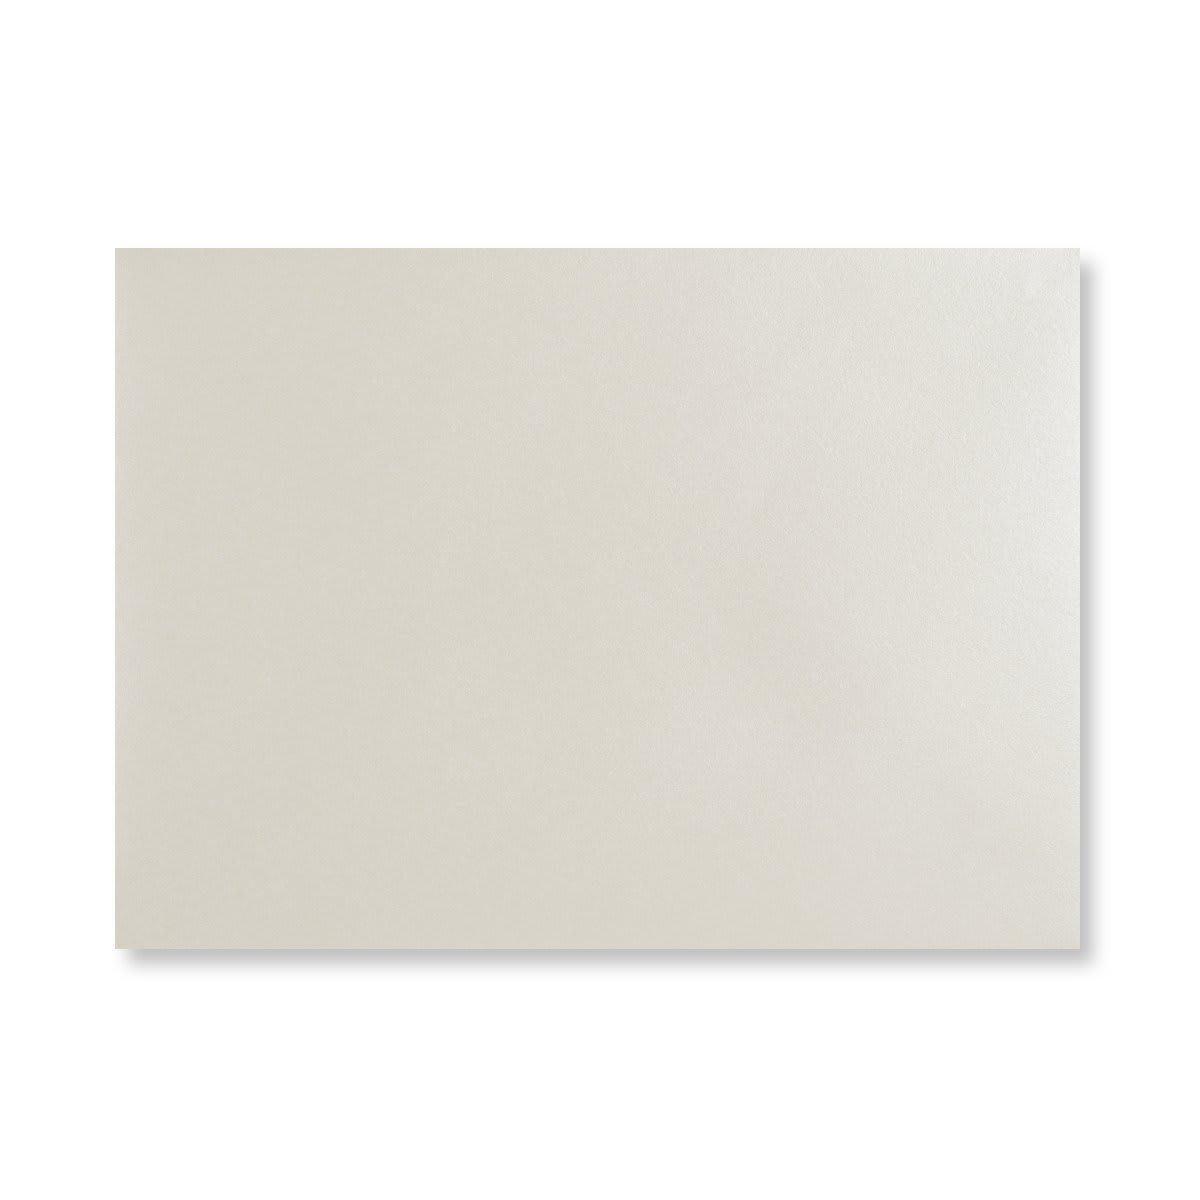 PEARLESCENT OYSTER WHITE 133 x 184mm ENVELOPES (i8)